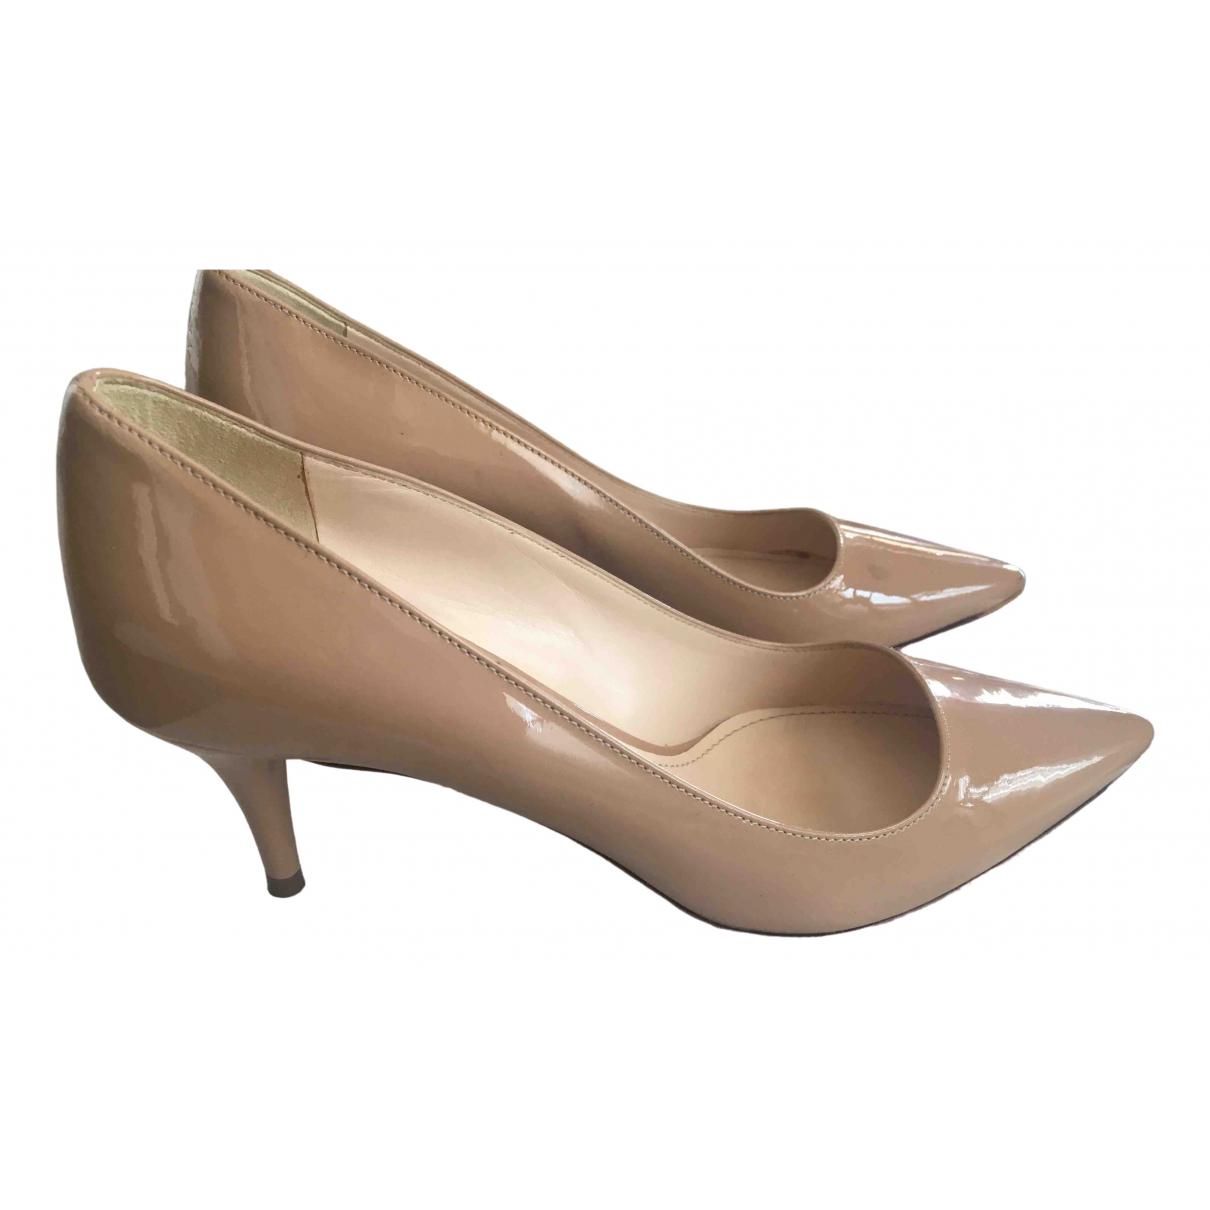 Prada \N Beige Patent leather Heels for Women 36 EU